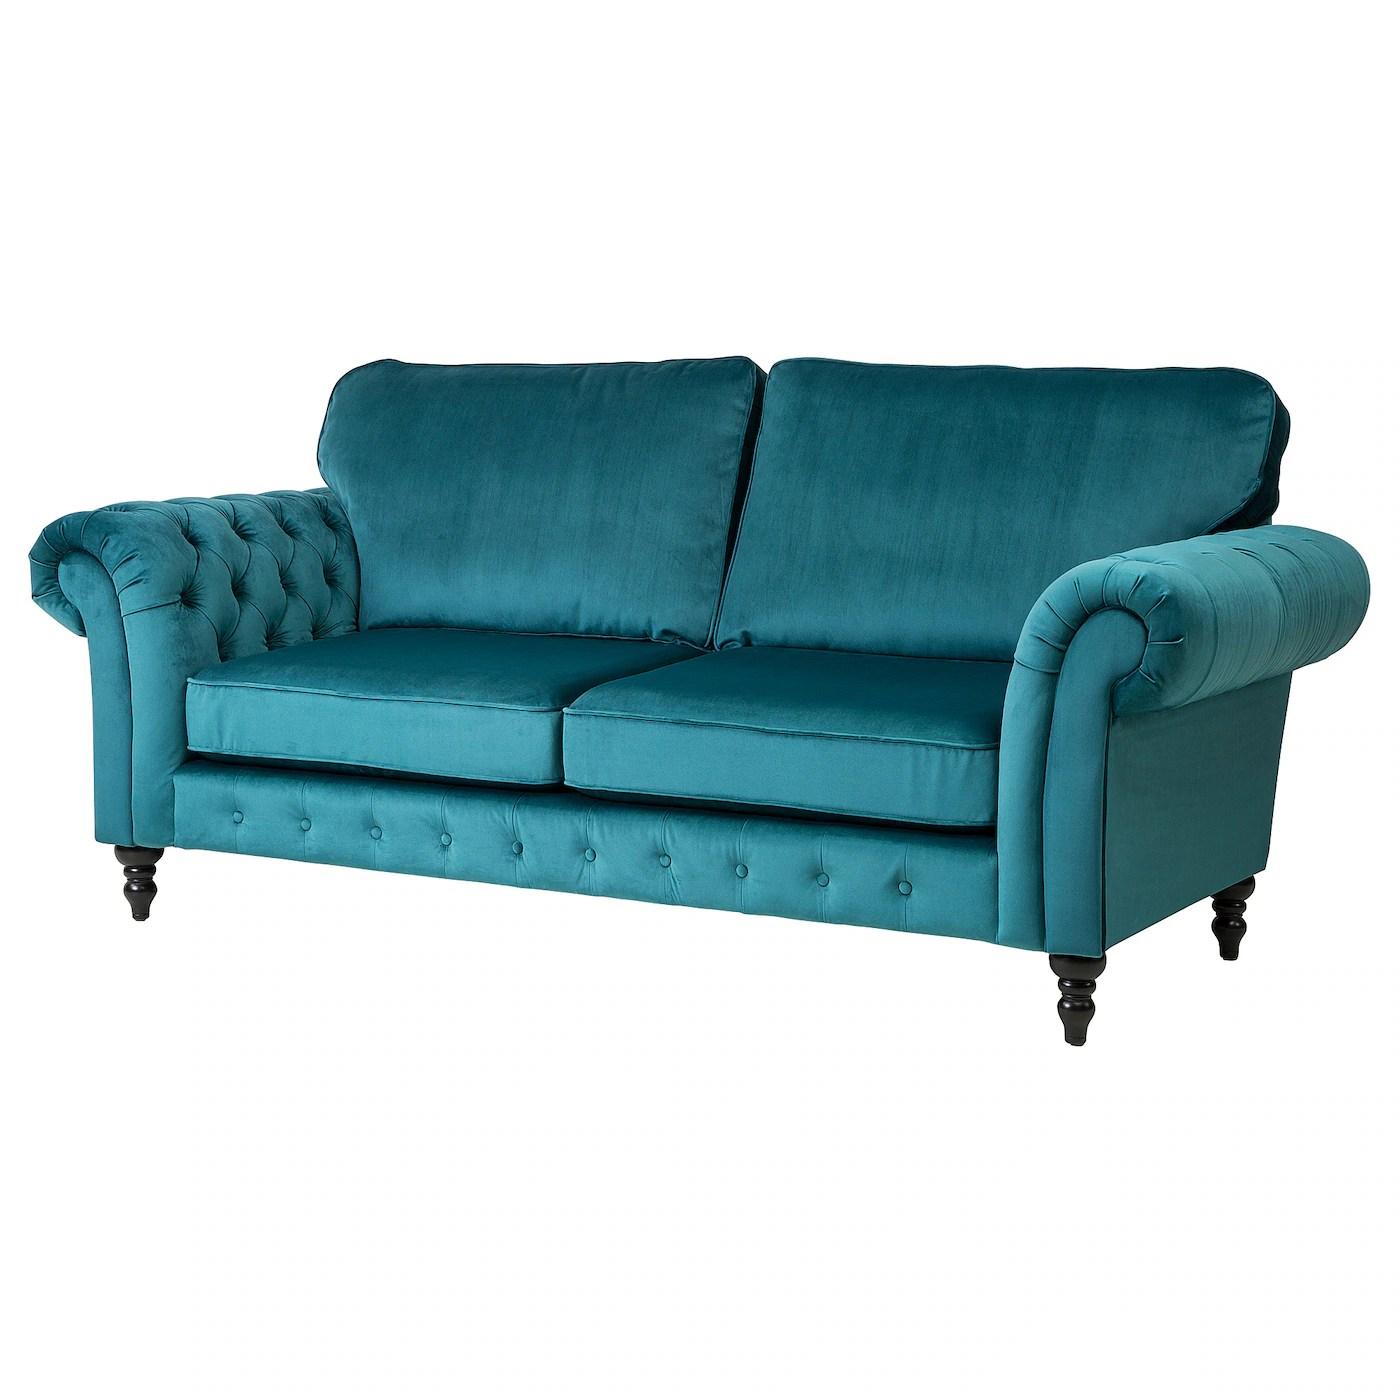 cheap teal sofas futon sofa beds uk grevie 3 seat velvet blue ikea